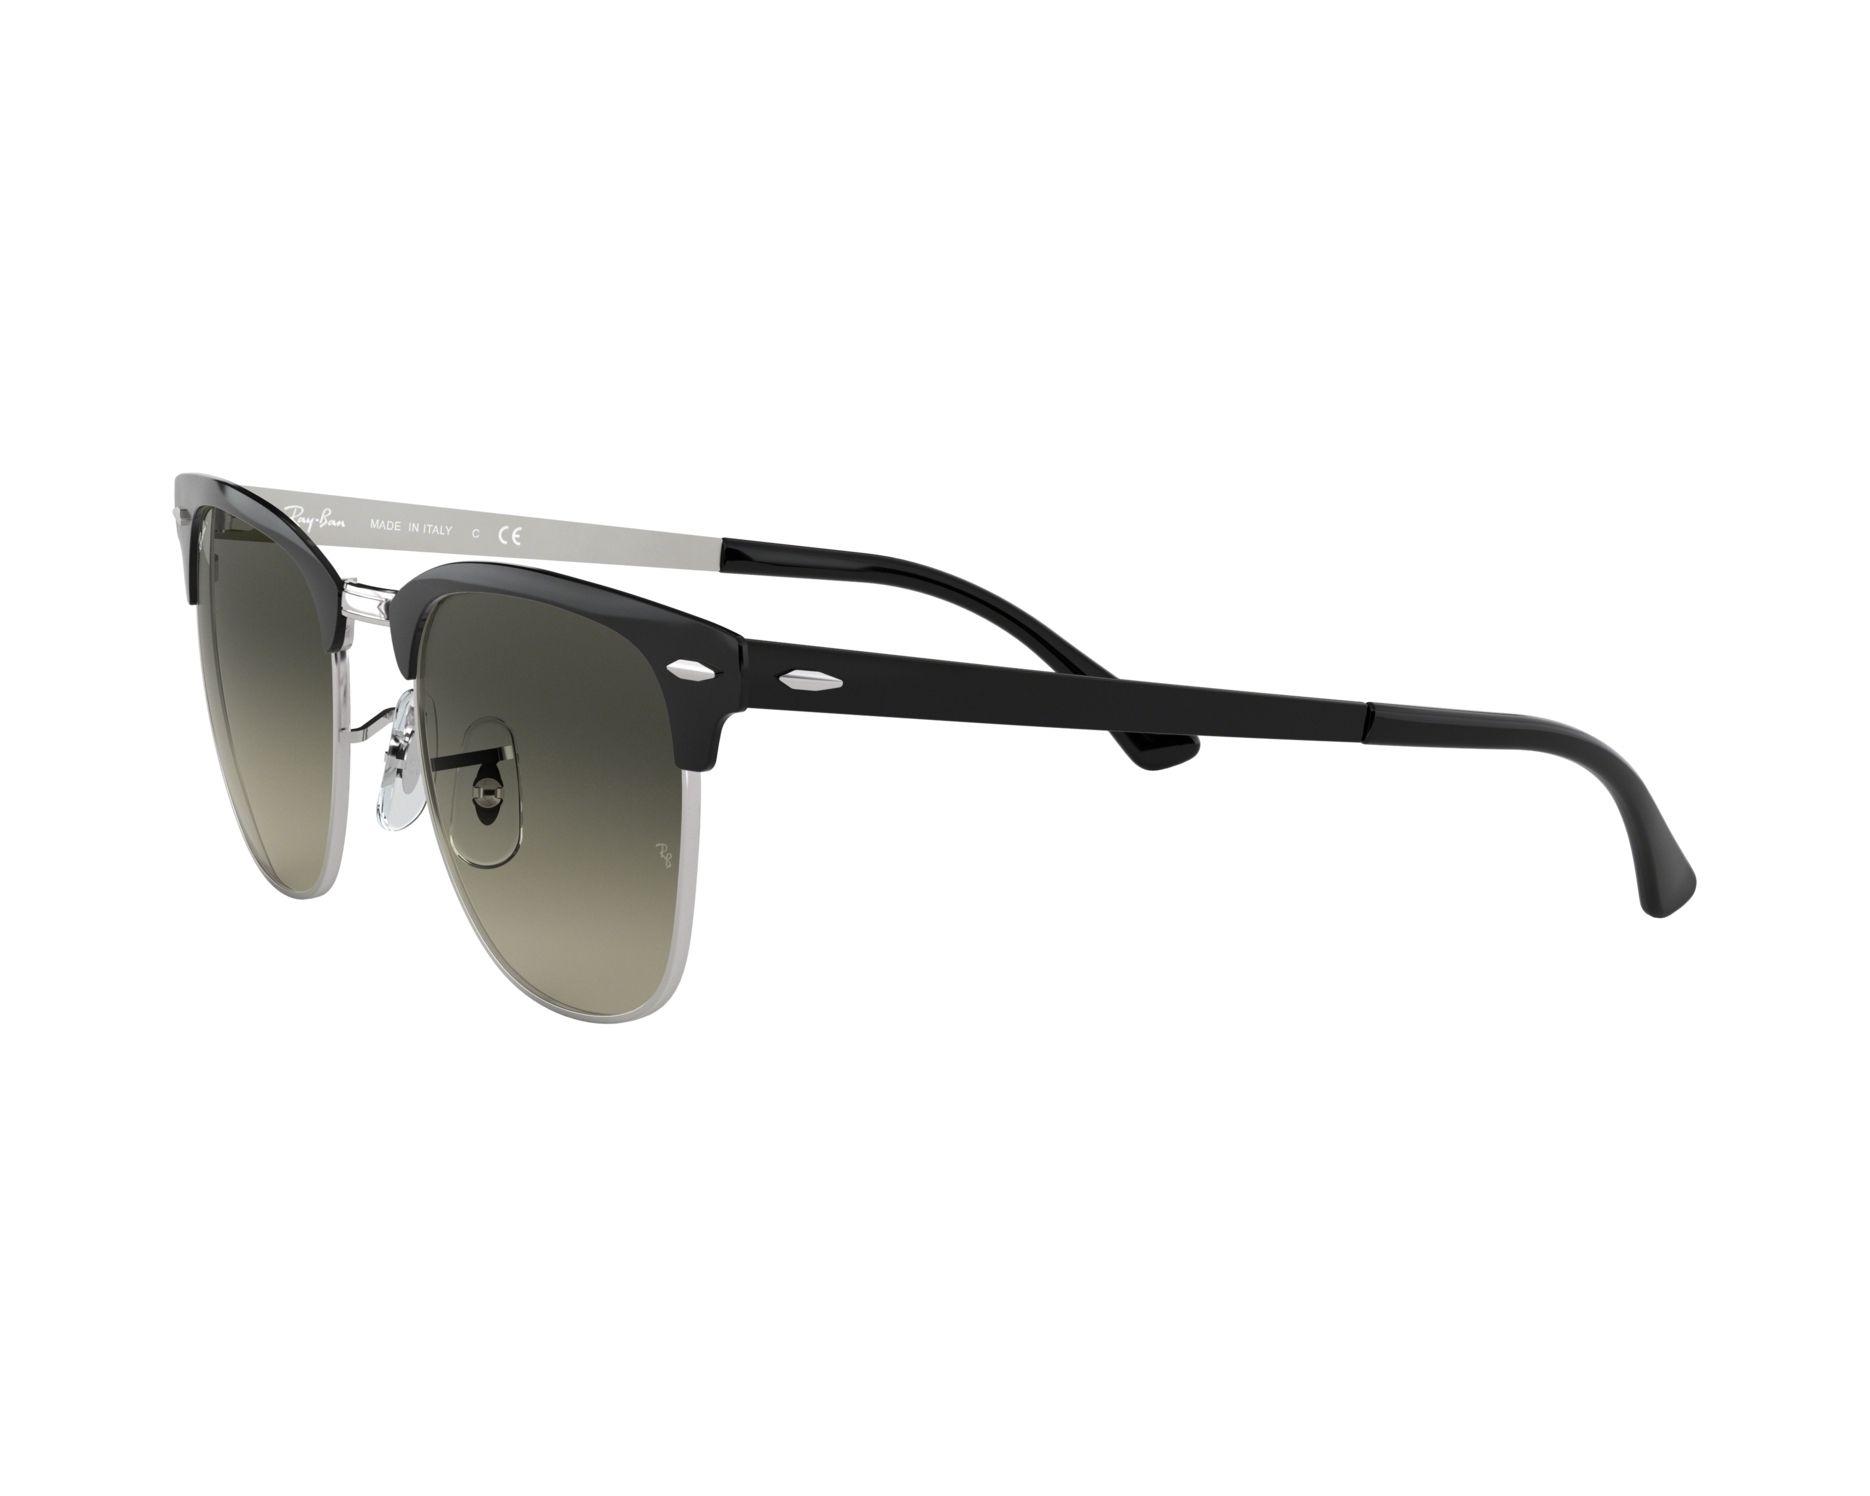 Ray-Ban RB3716 Sonnenbrille Silber/ Schwarz 900471 51mm KgKYdLX